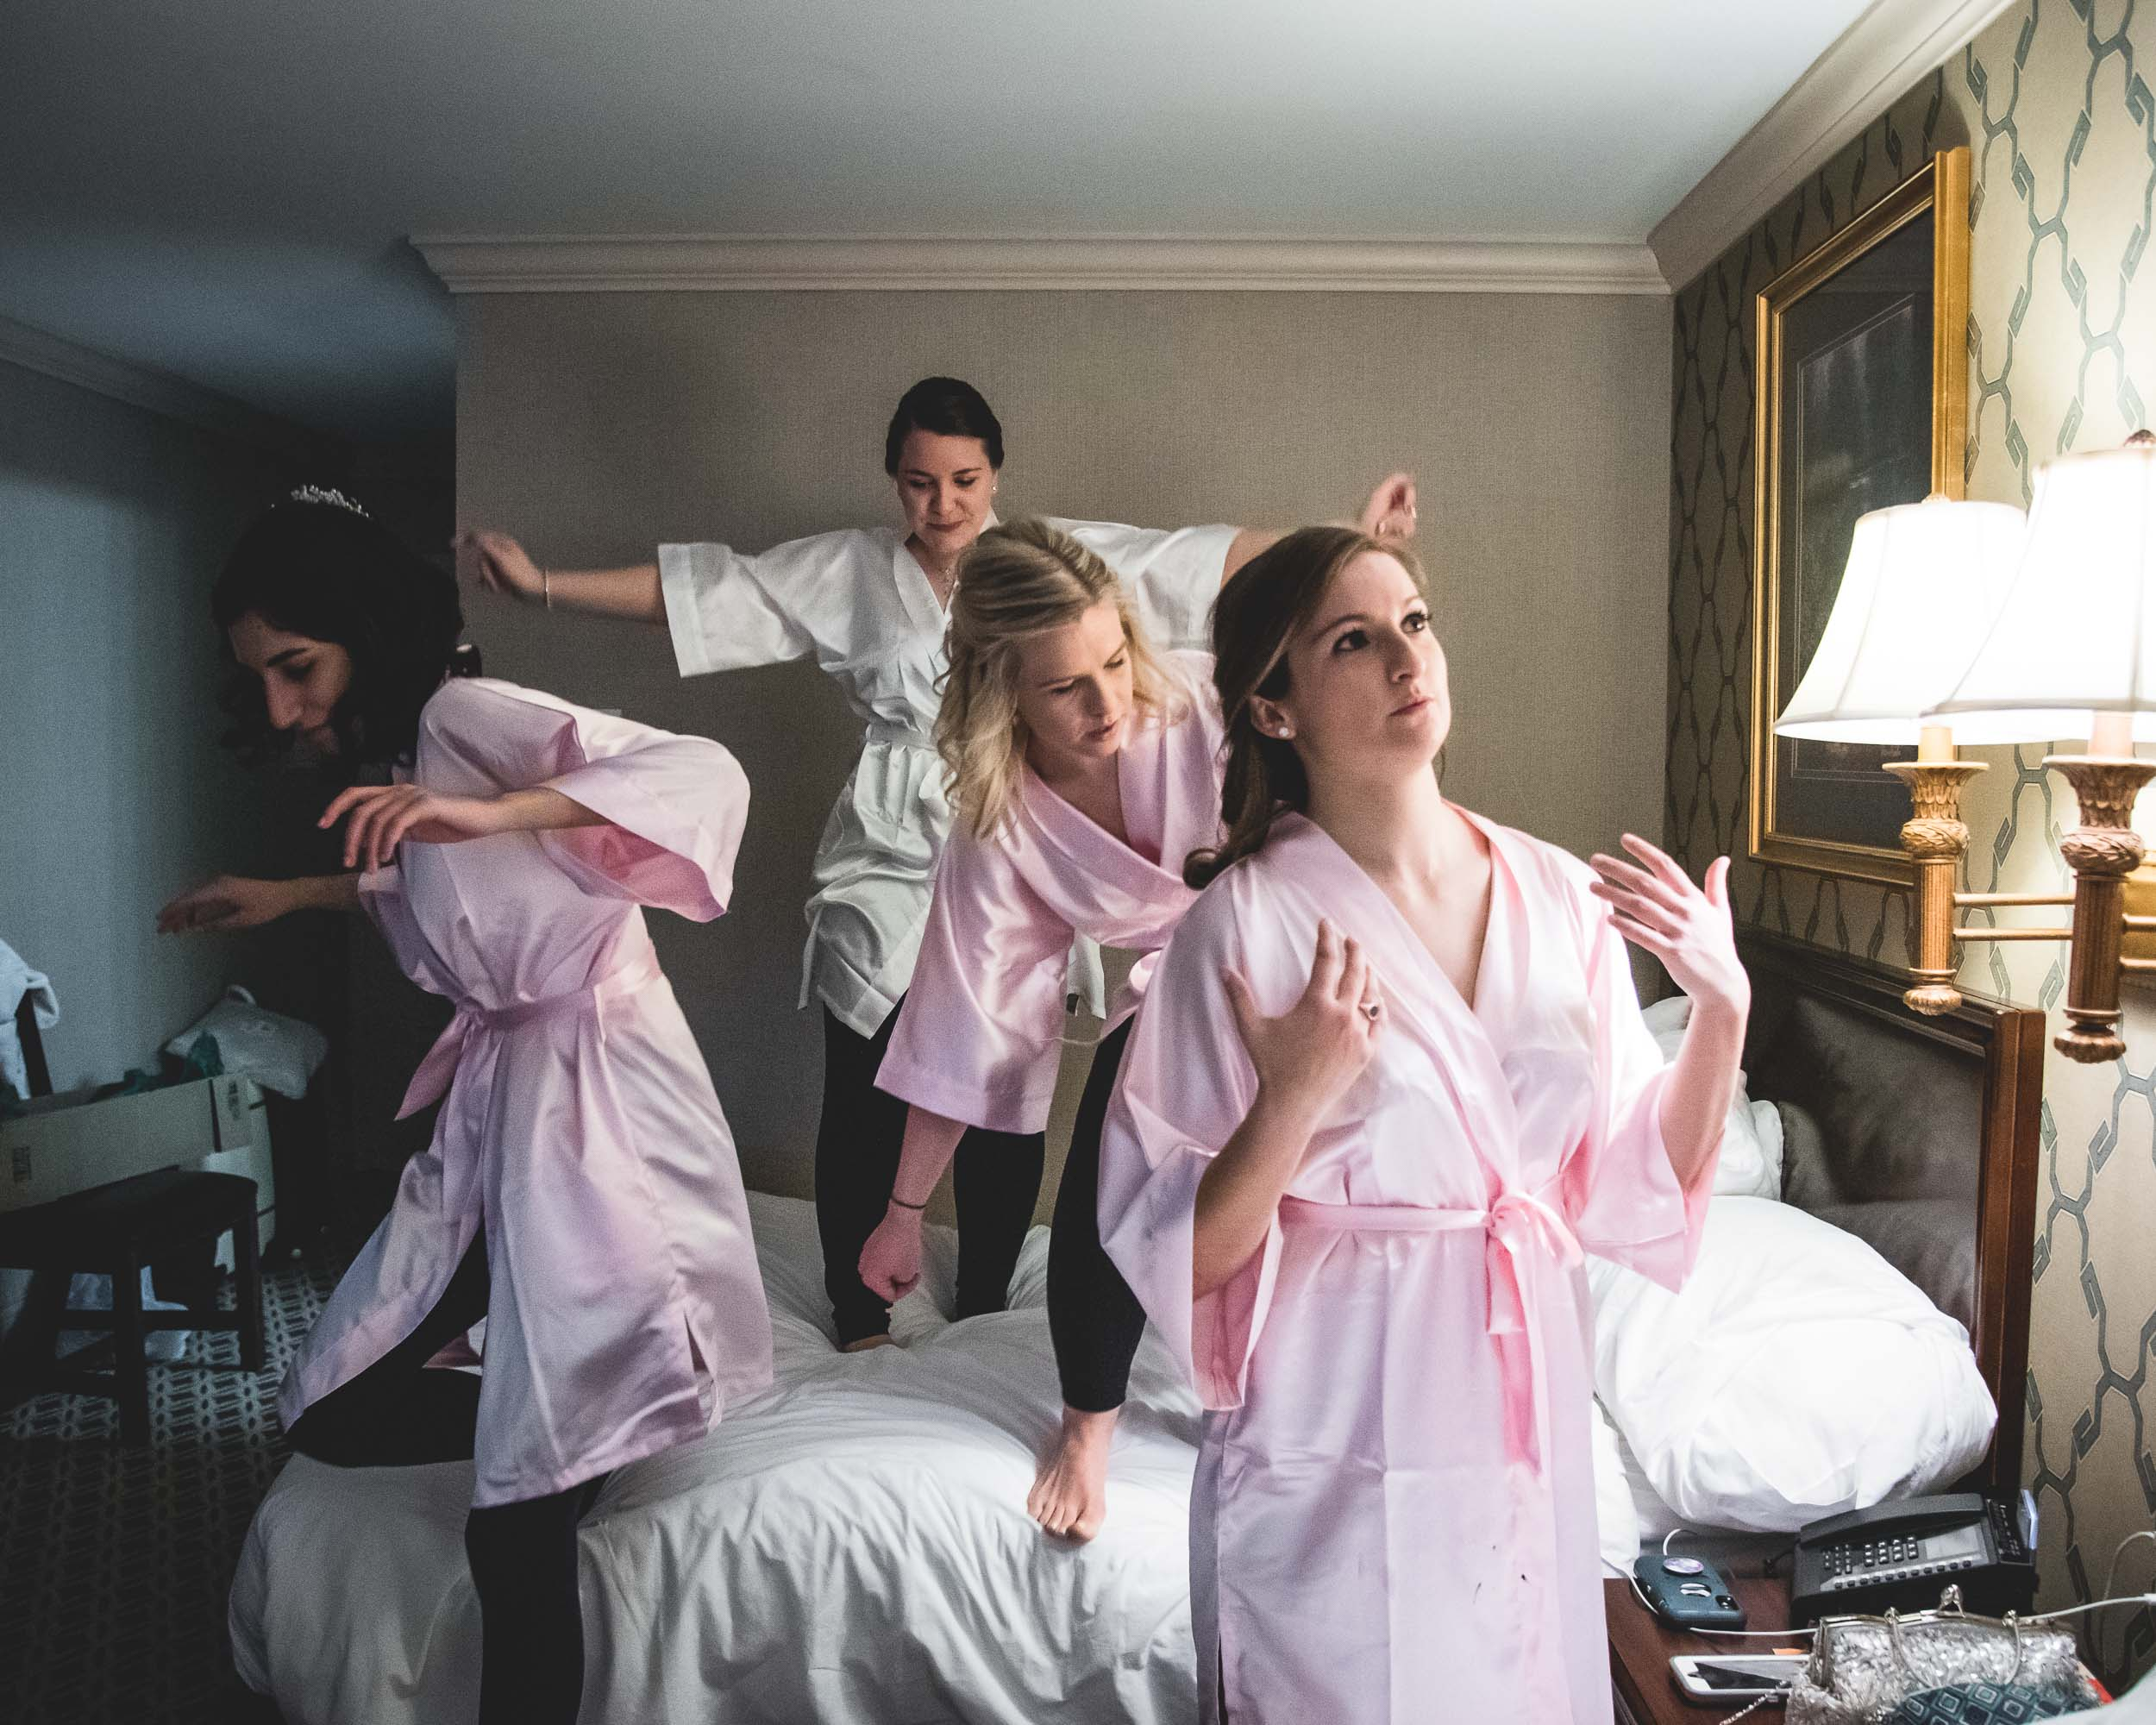 KatieandMathias_Morristown_NewJersey_Wedding_Church_Assumption_Madison_Hotel(5of65).jpg